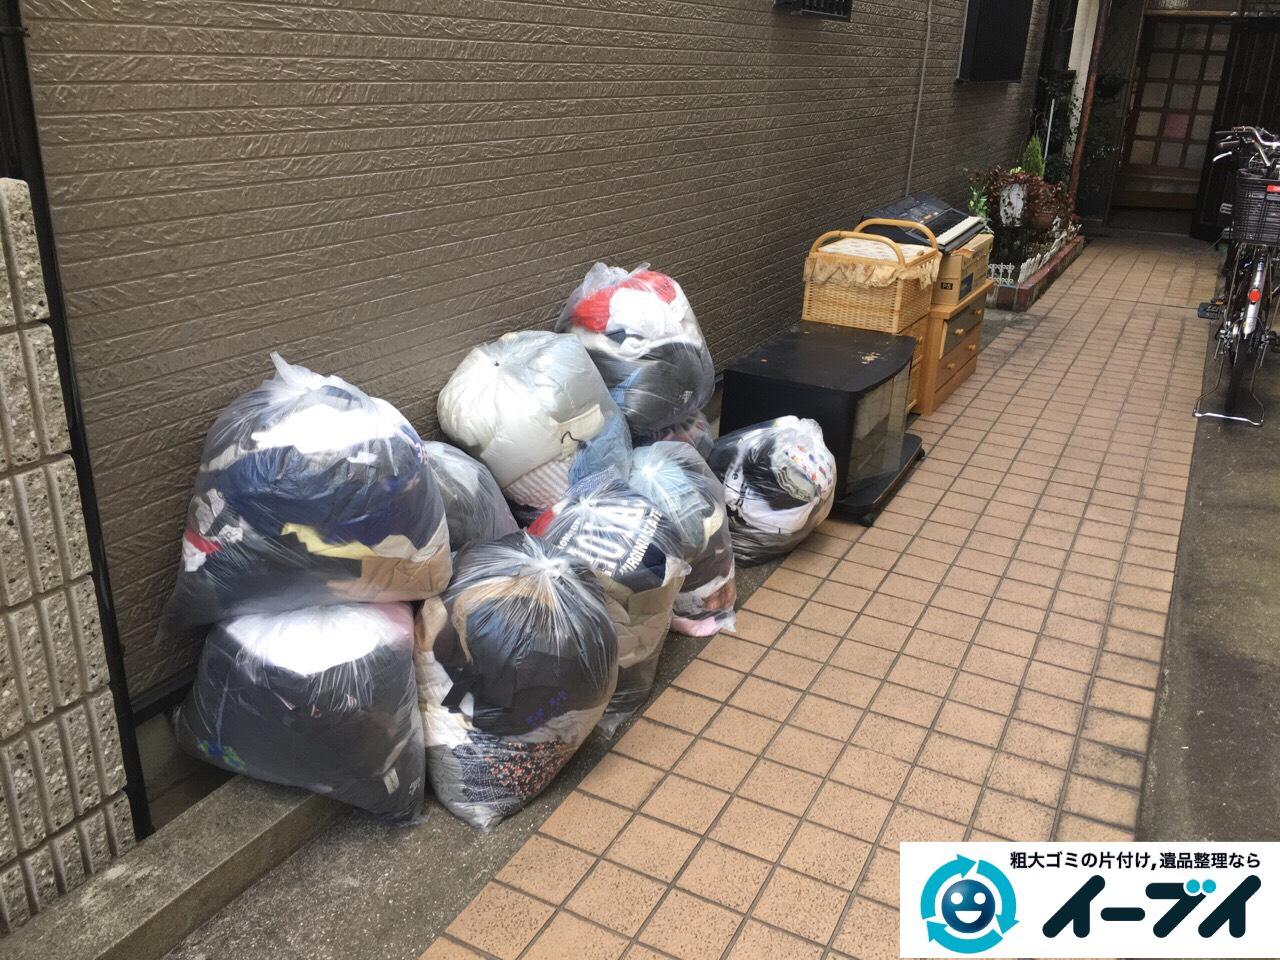 衣類 大阪 ゴミ 市